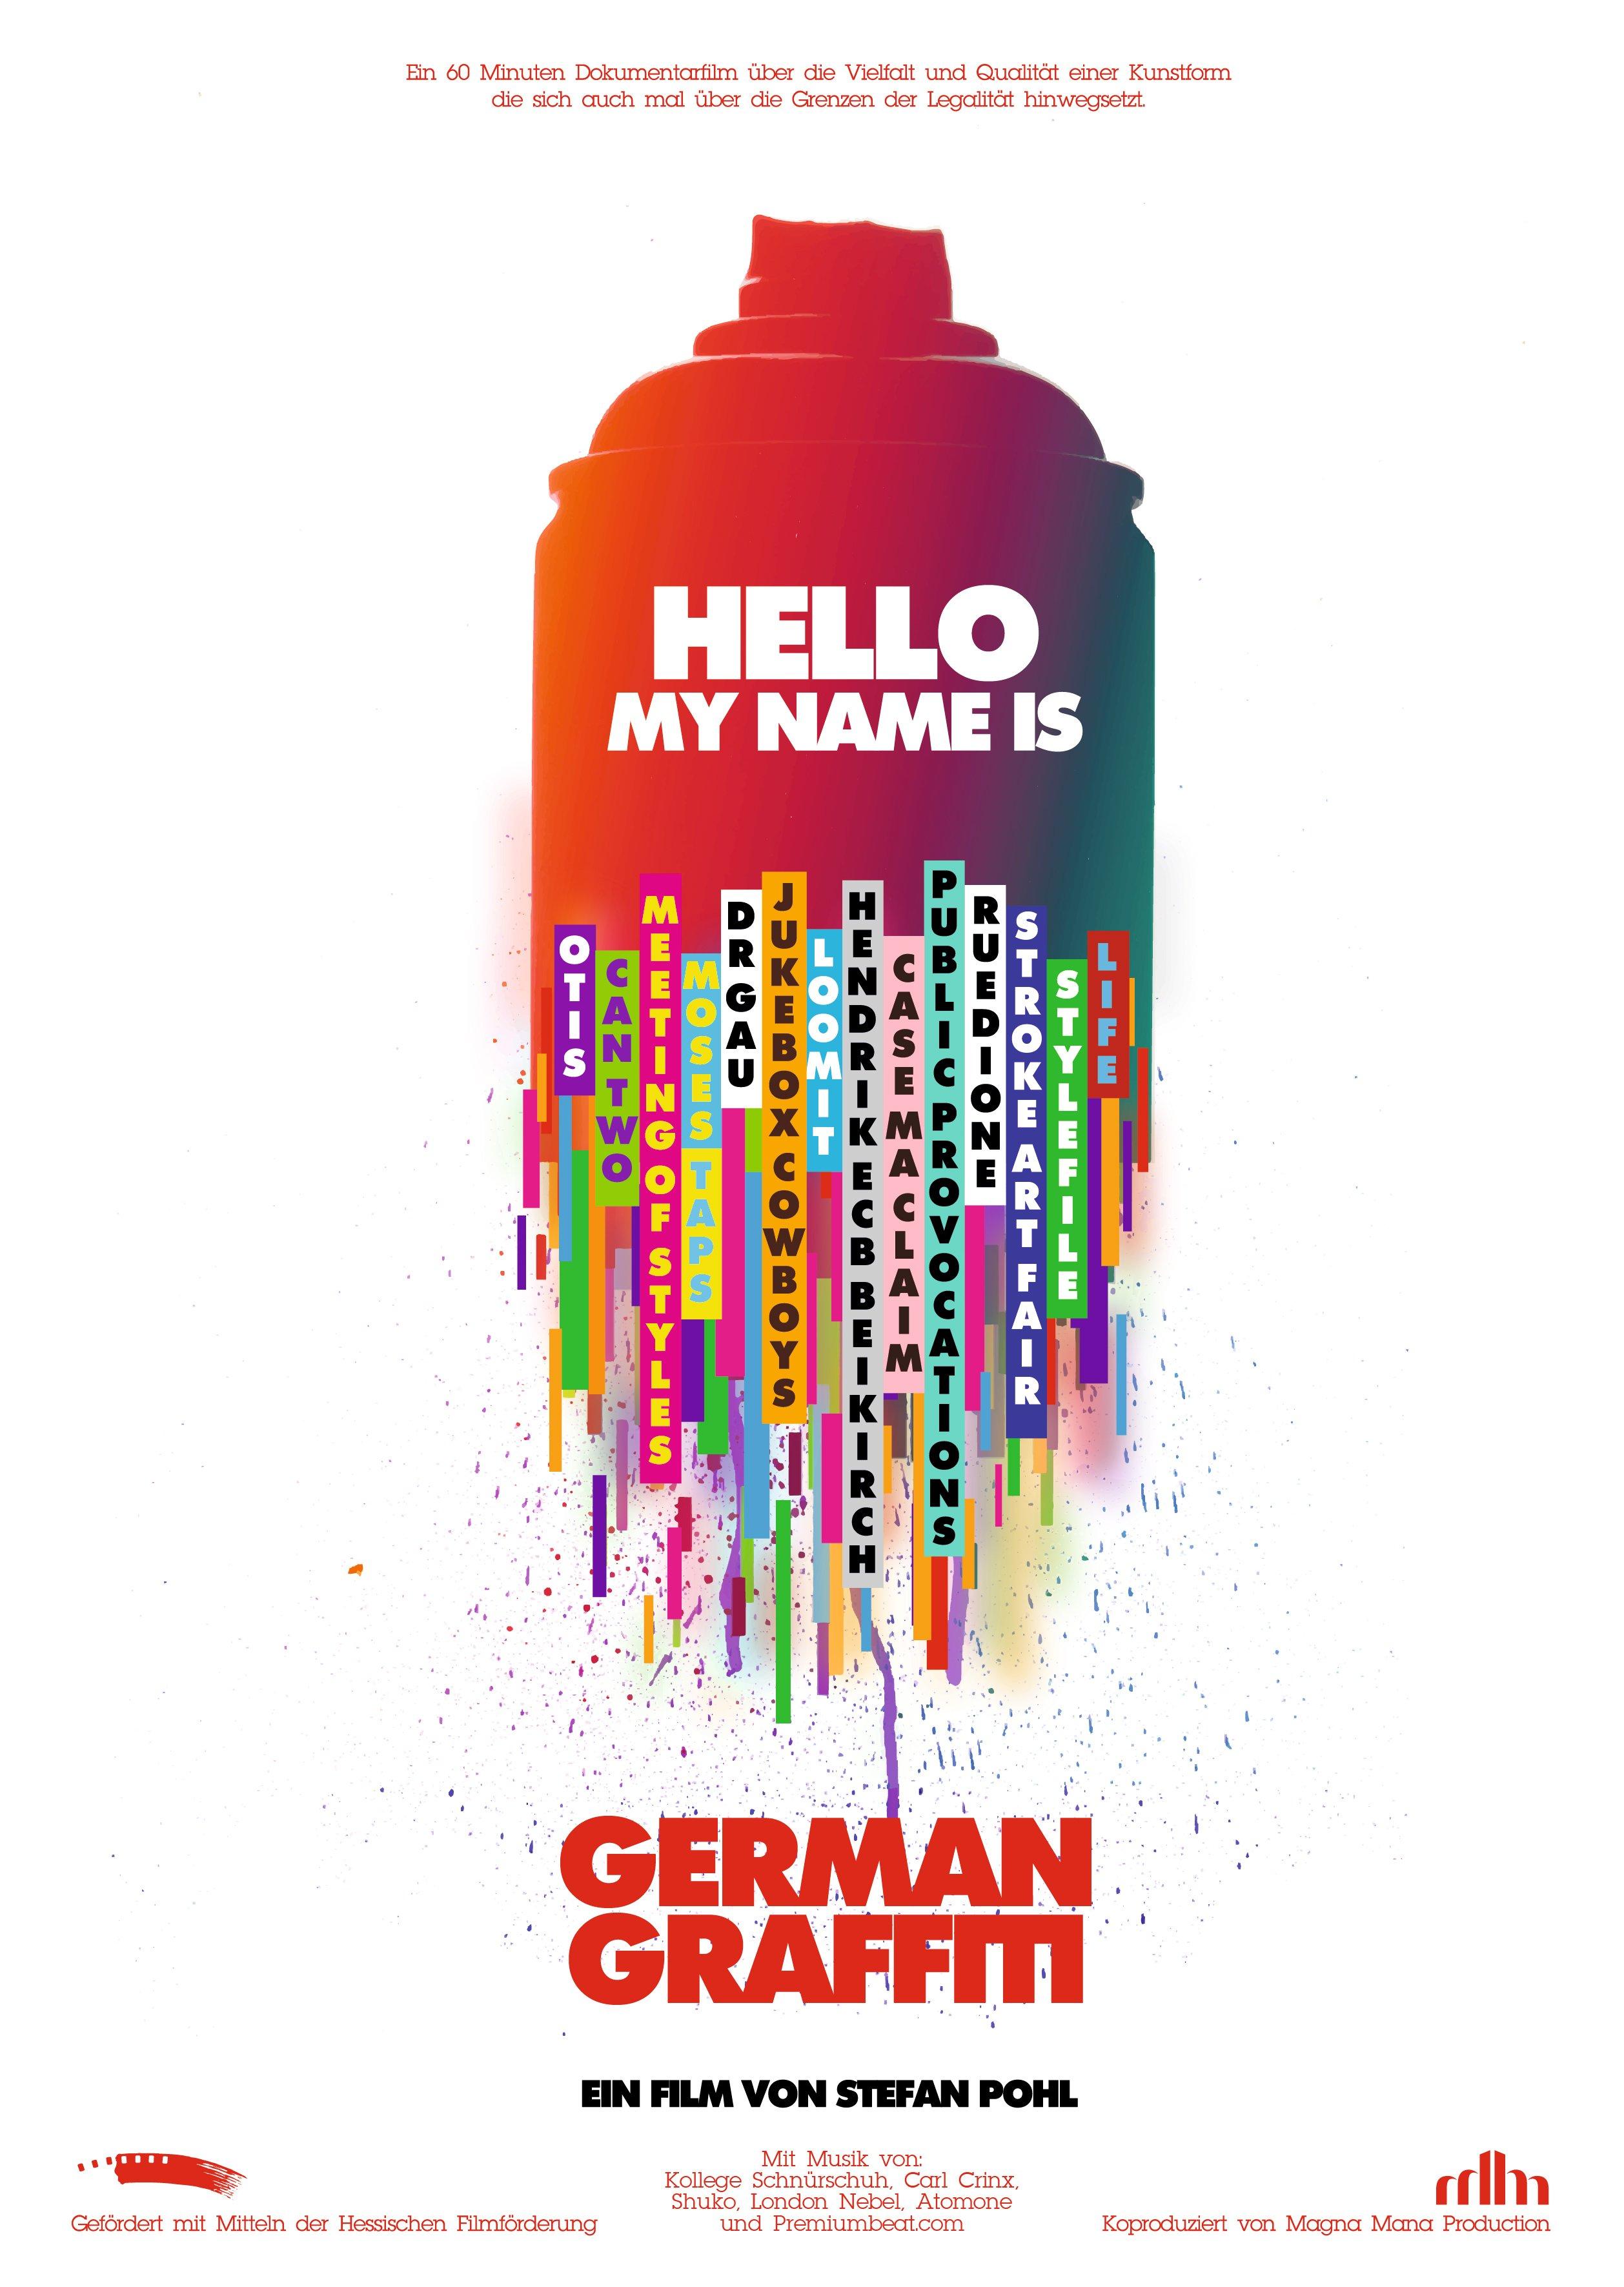 Filmabend: Hello my name is...& Gespräch mit Filmemacher Stefan Pohl - © Stefan Pohl